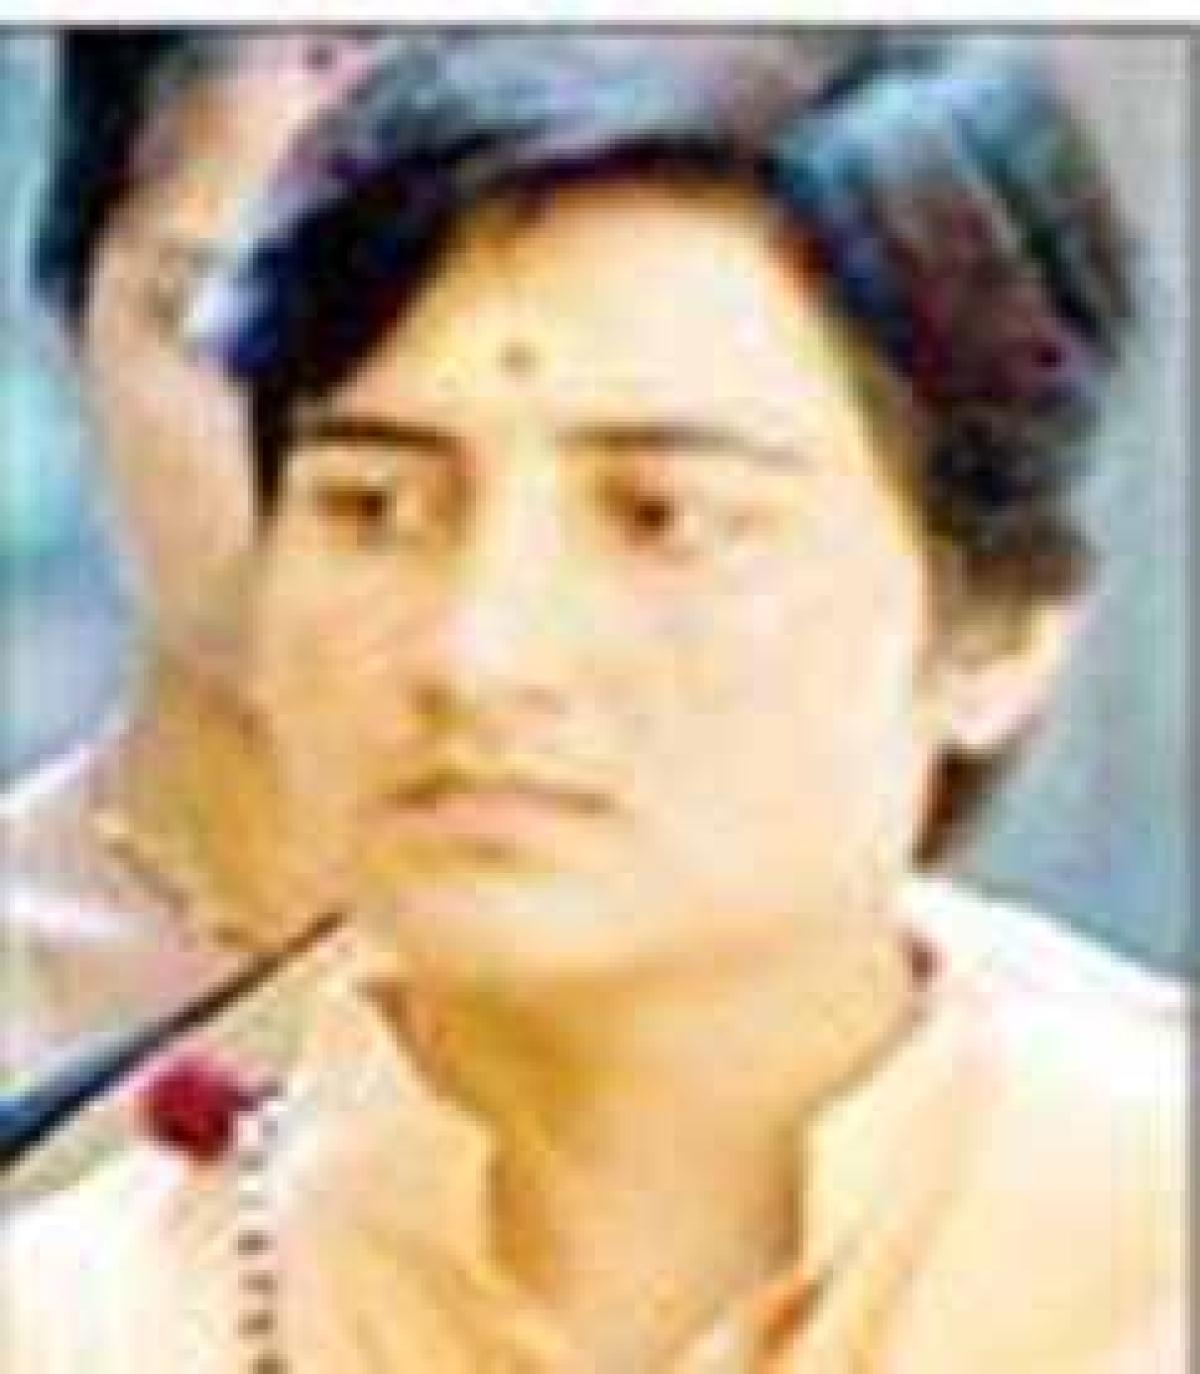 Pragya dissatisfied with medical aid